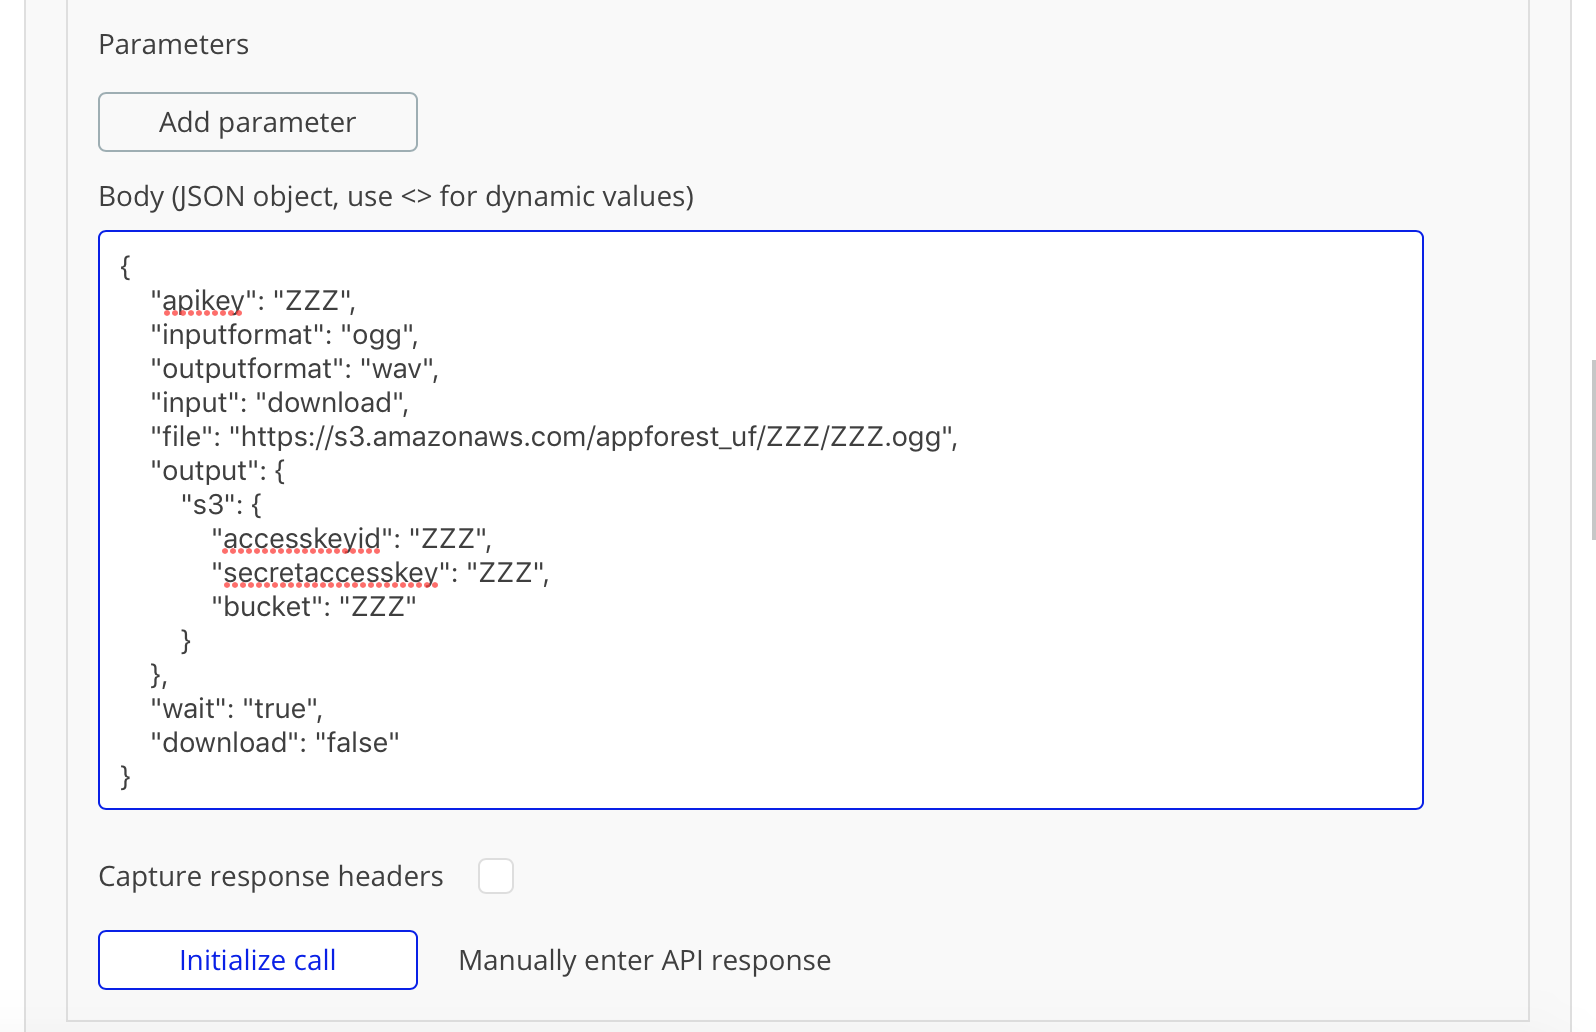 CloudConvert API: Call not working properly - APIs - Bubble